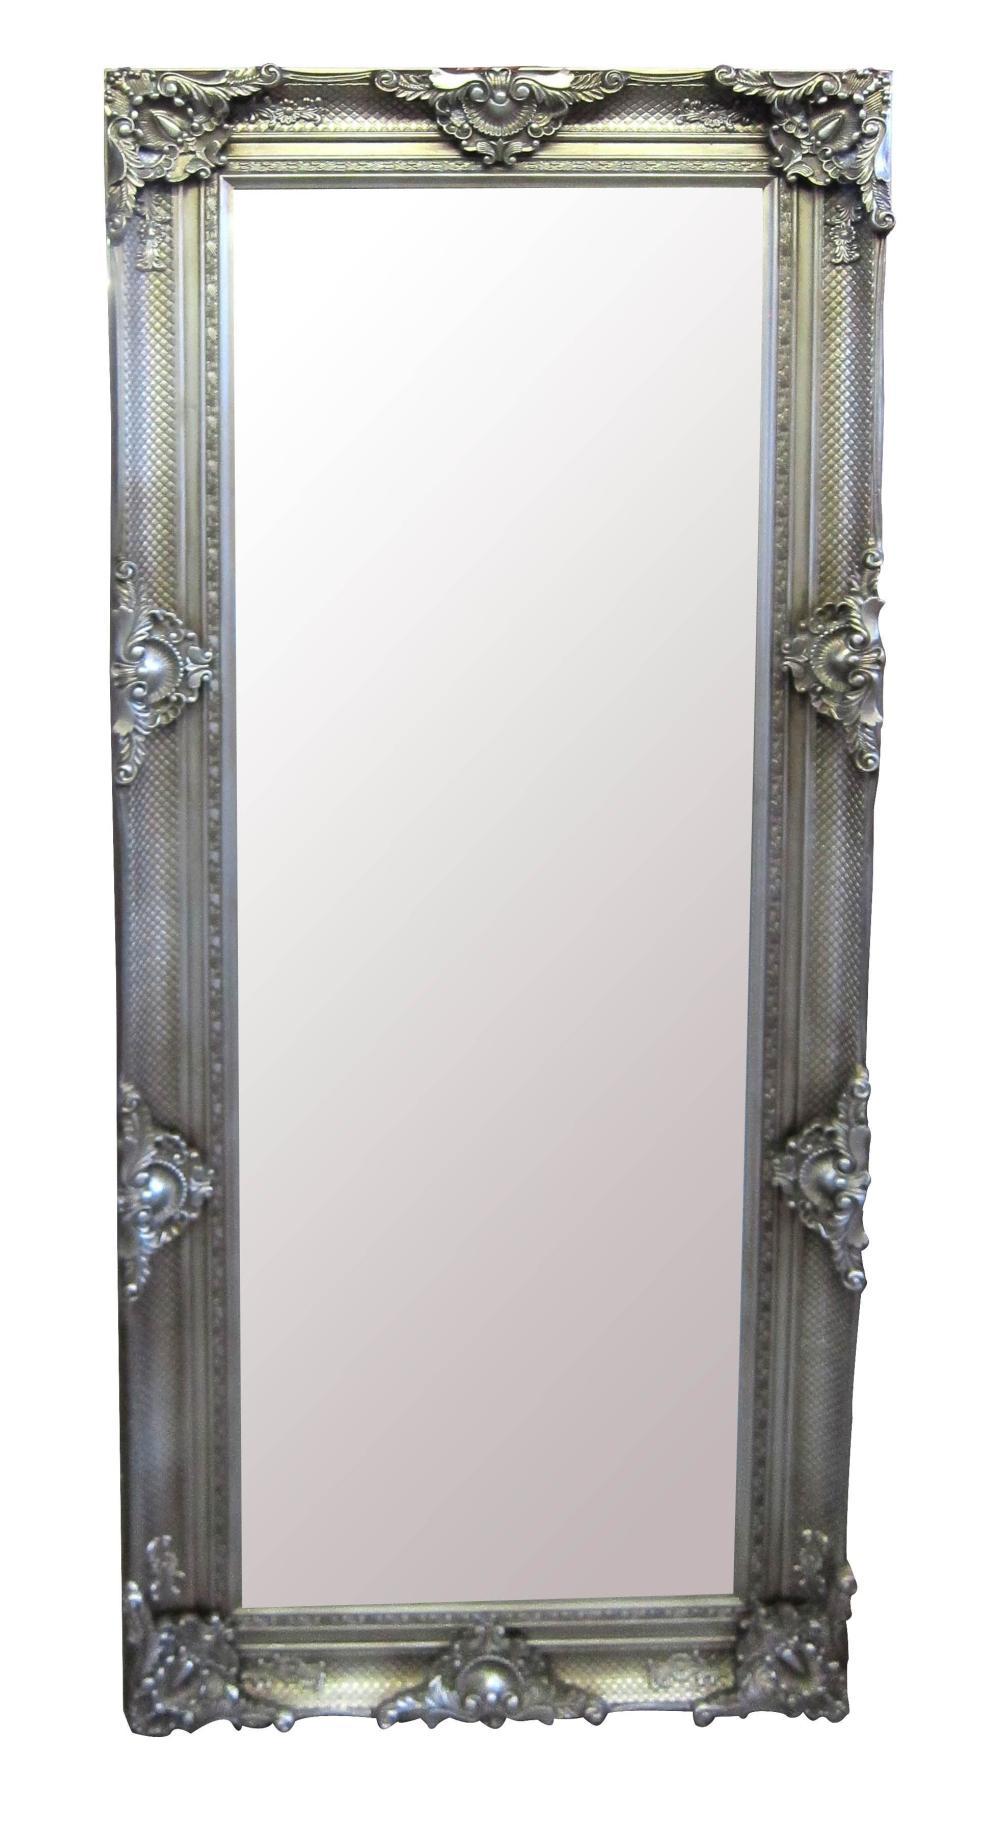 Rectangular wood-framed mirror